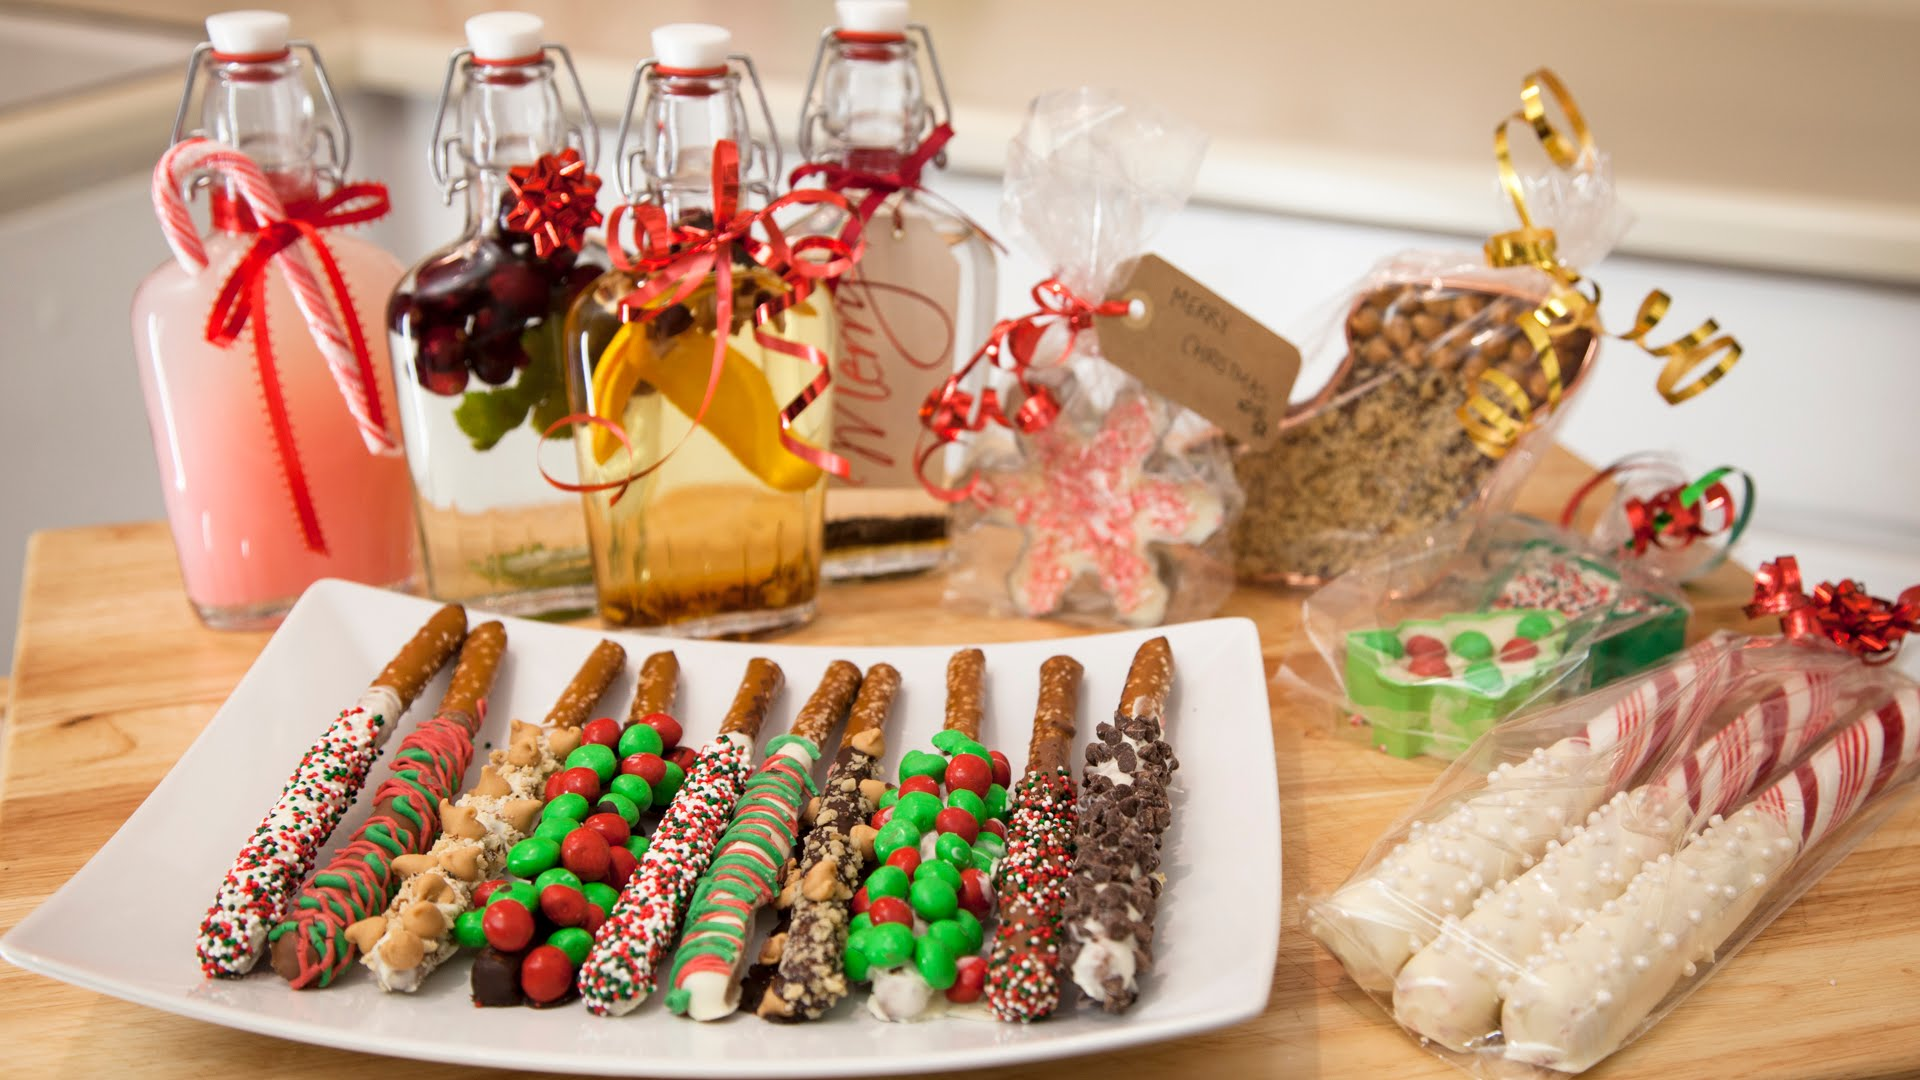 10 Homemade Edible Gifts For Christmas - Women Fitness